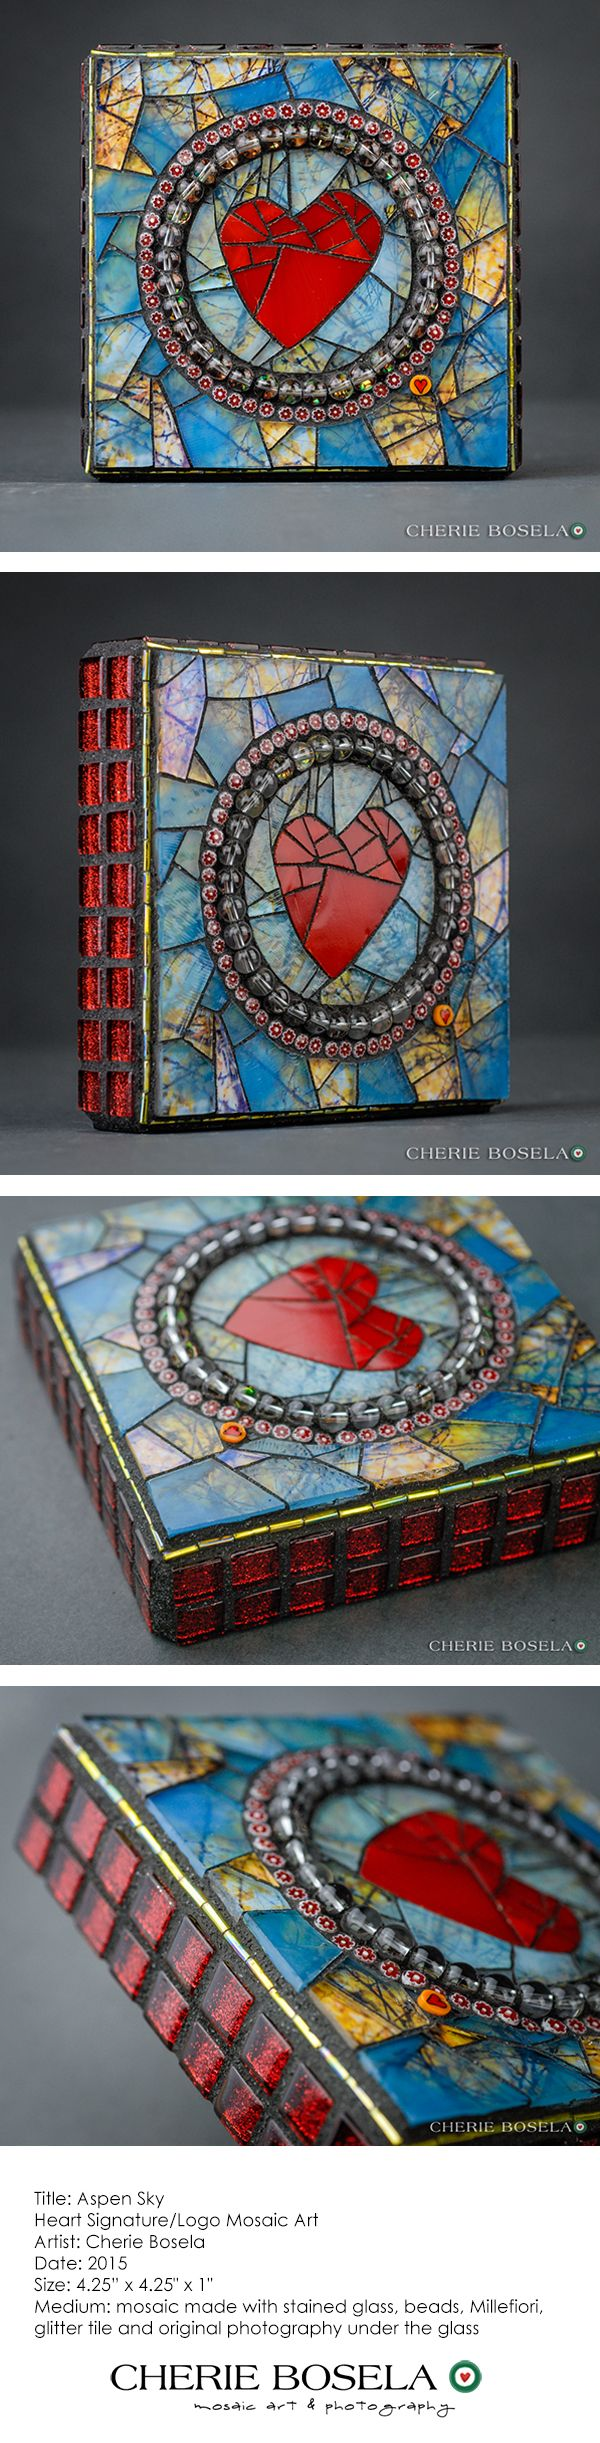 Aspen Sky - Heart Signature/Logo Mosaic Art by Cherie Bosela